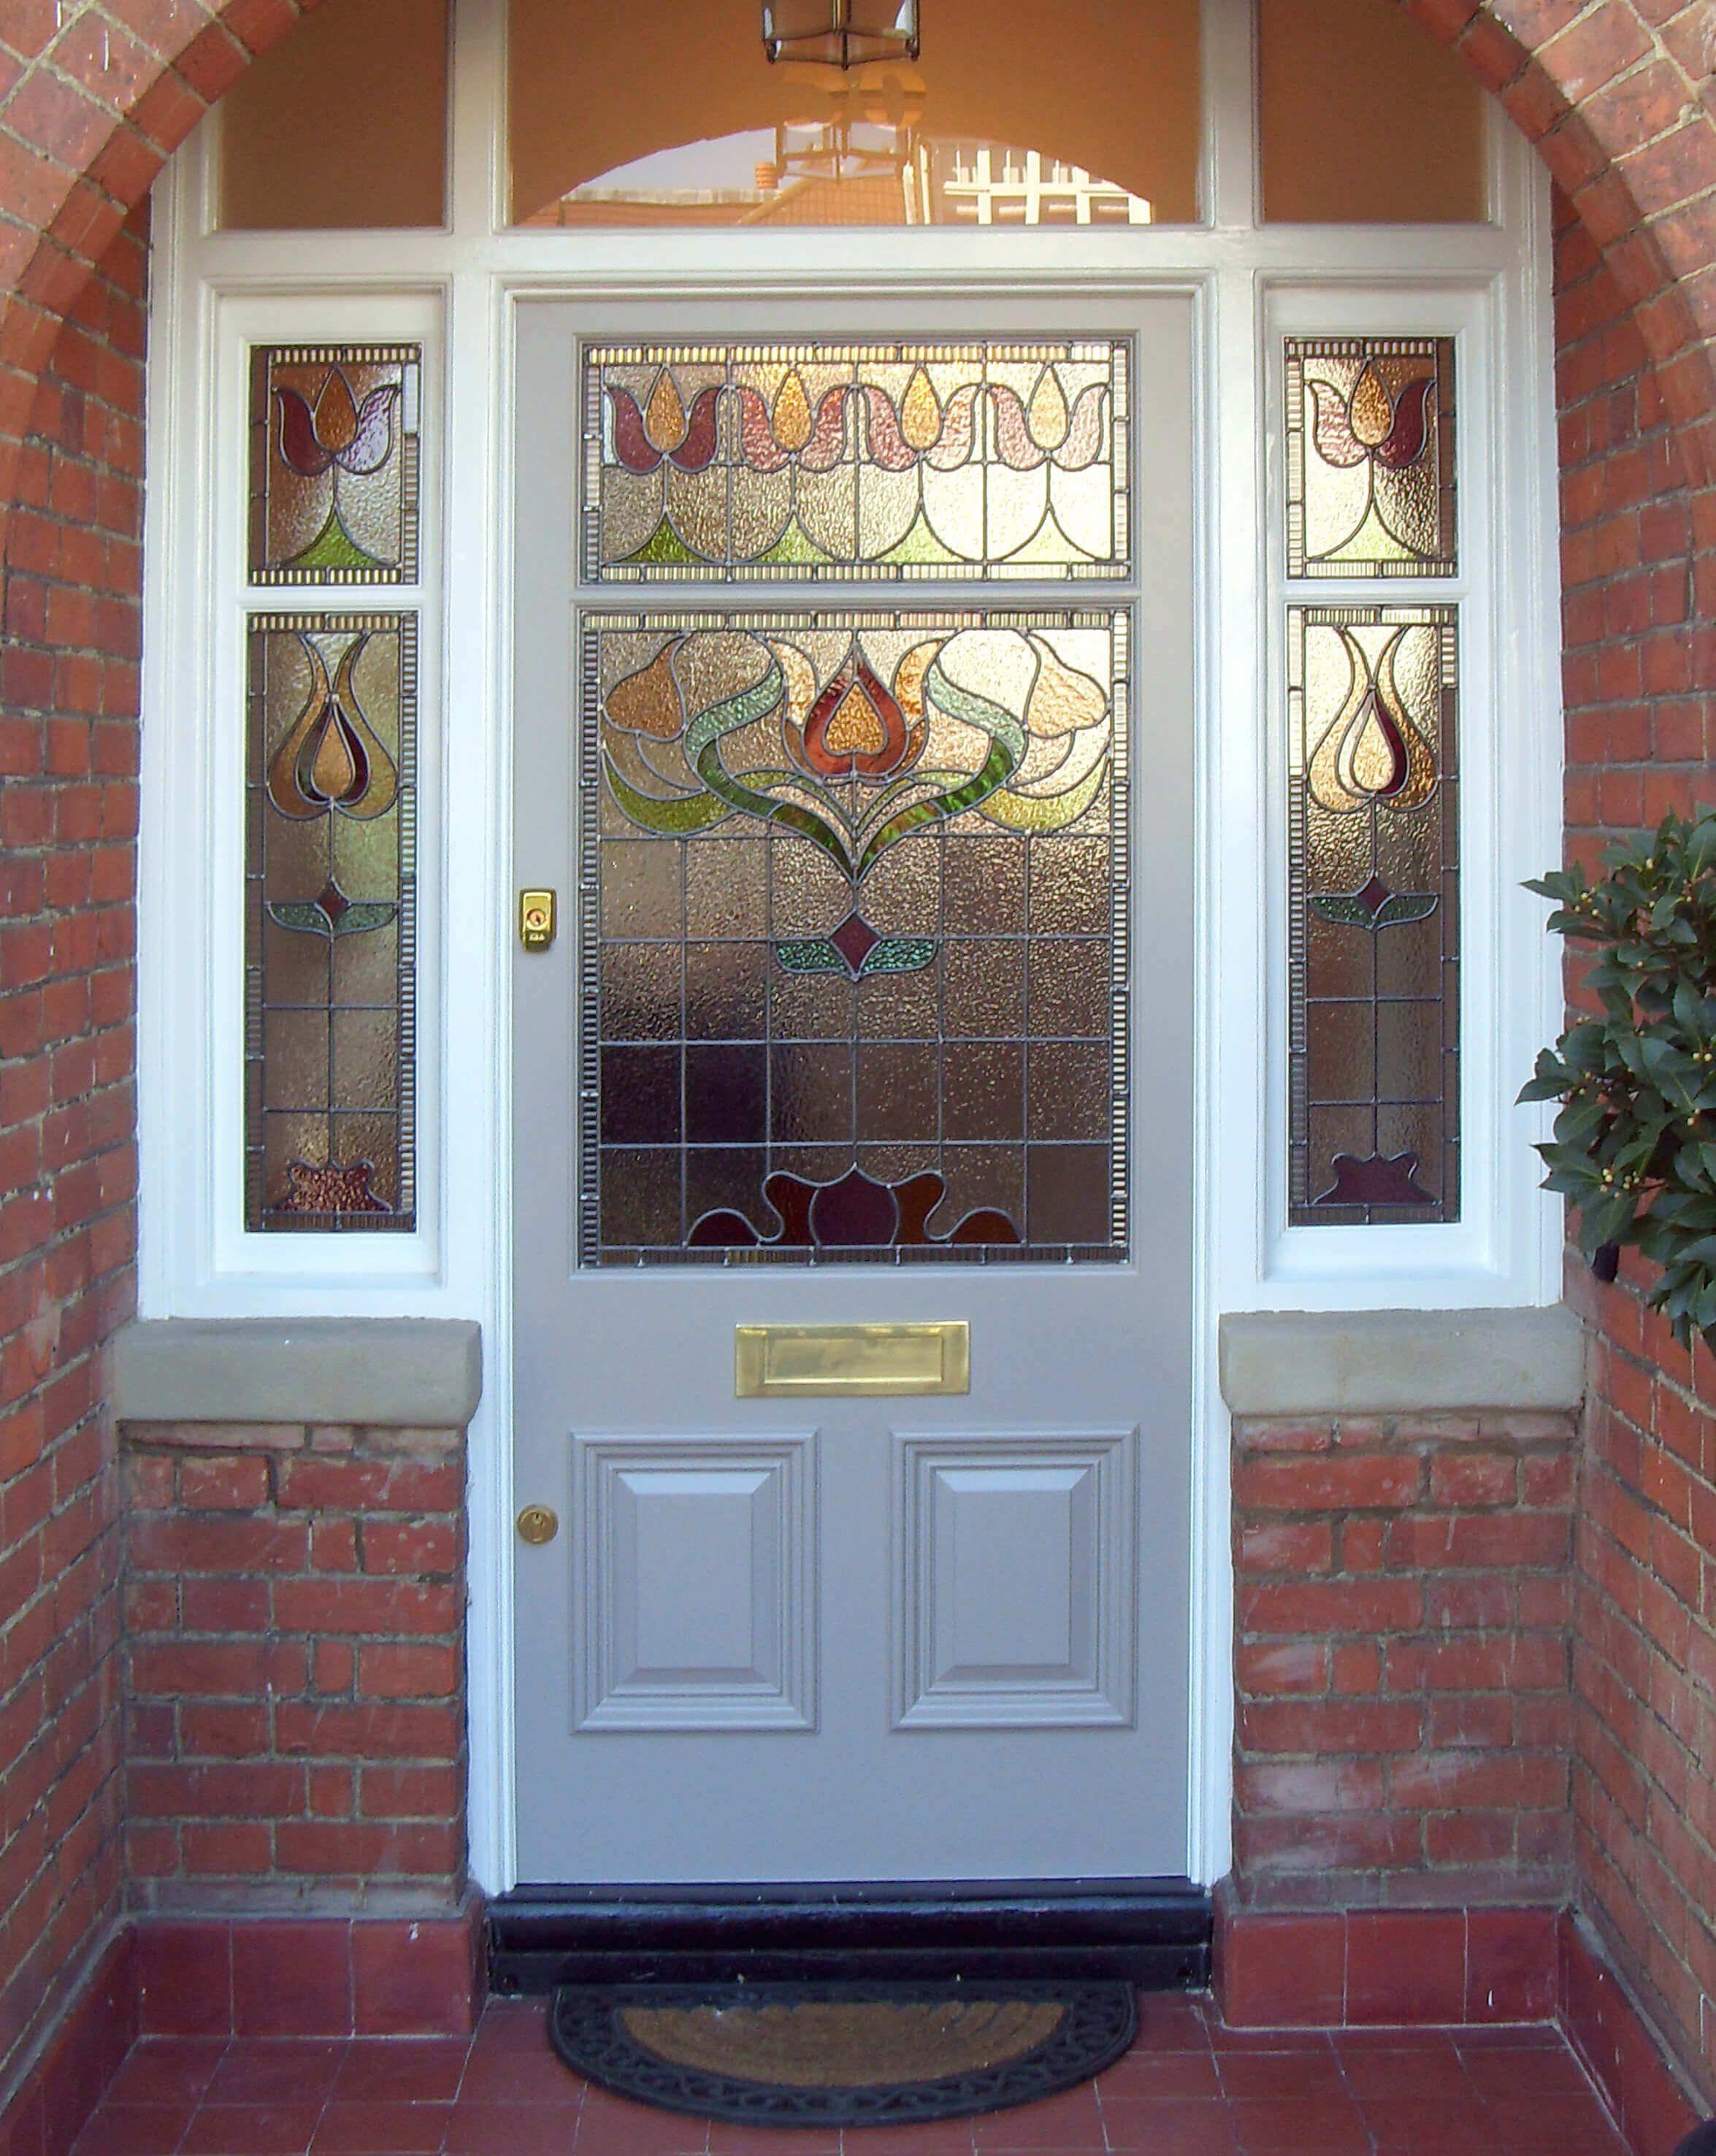 Custom Edwardian Front Door With Door Frame And Clear Glass Panels In The Same S 1000 In 2020 Exterior Doors With Glass Cottage Front Doors Painted Front Doors